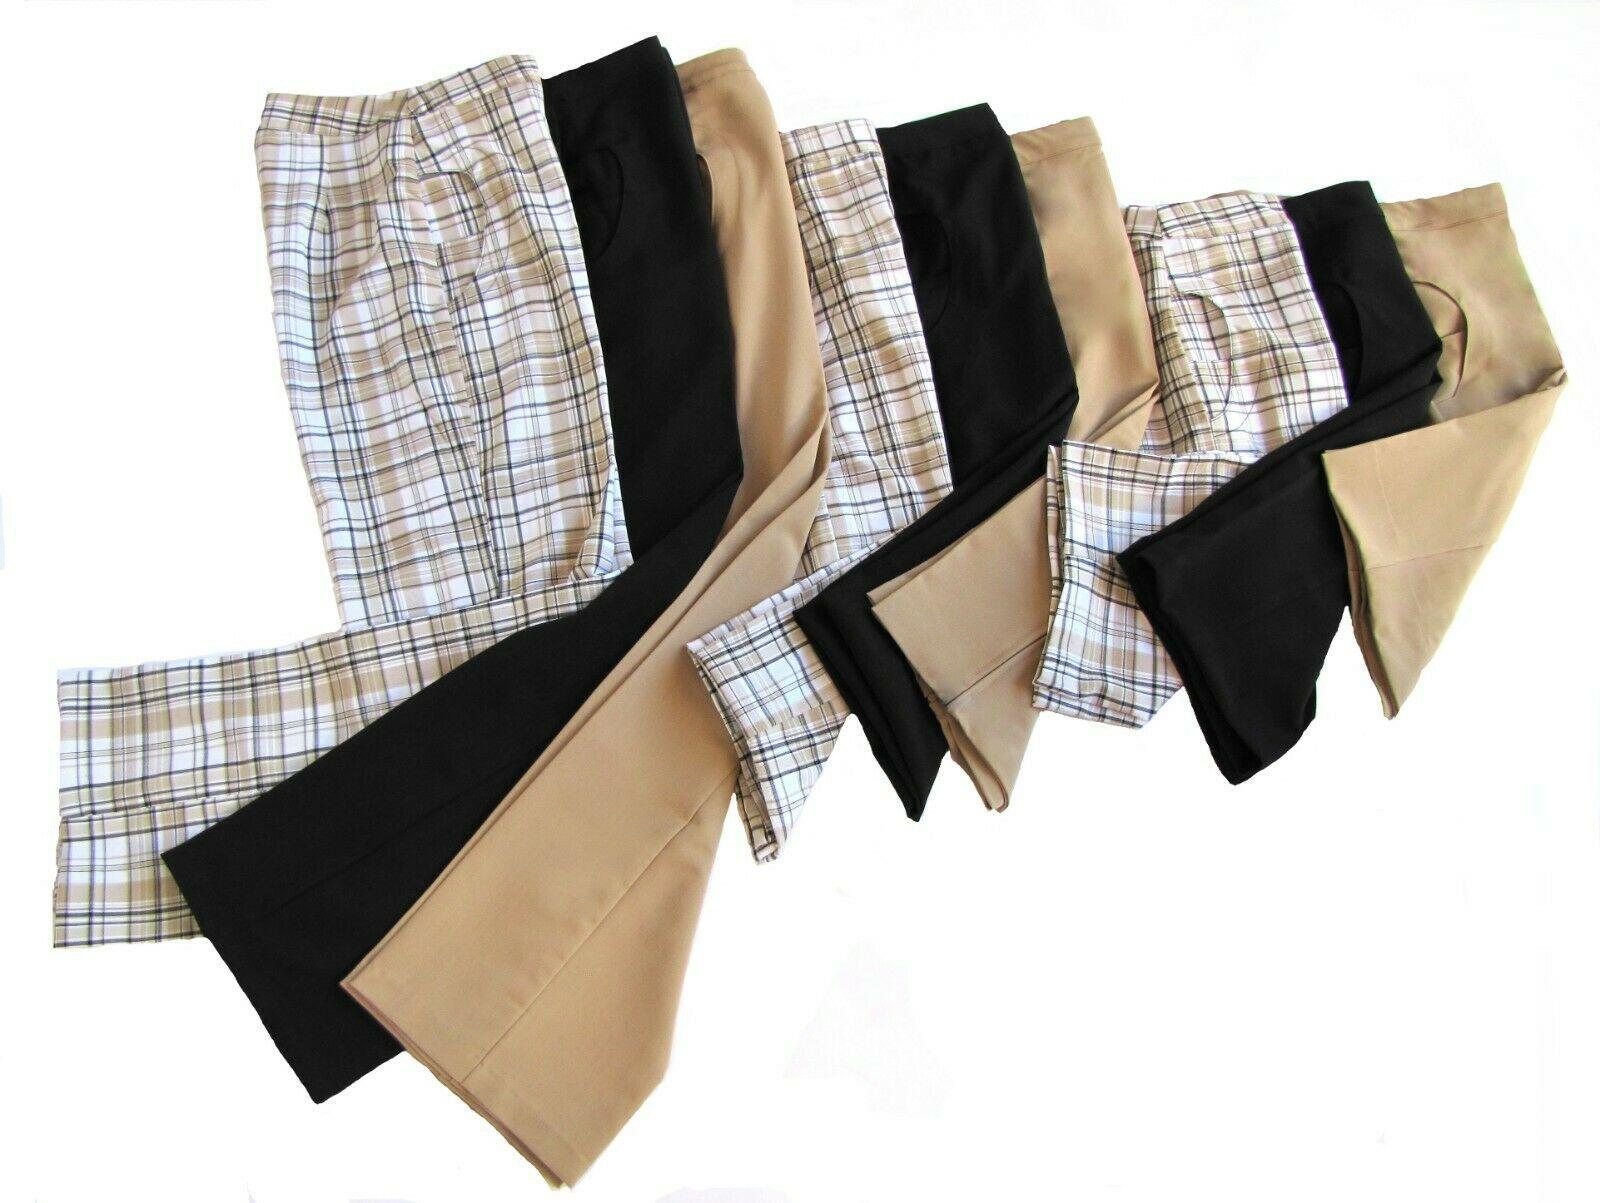 Stylish Women's Golf & Casual Tan Short Sleeve Mock Polo, Rhinestone Zipper  image 4